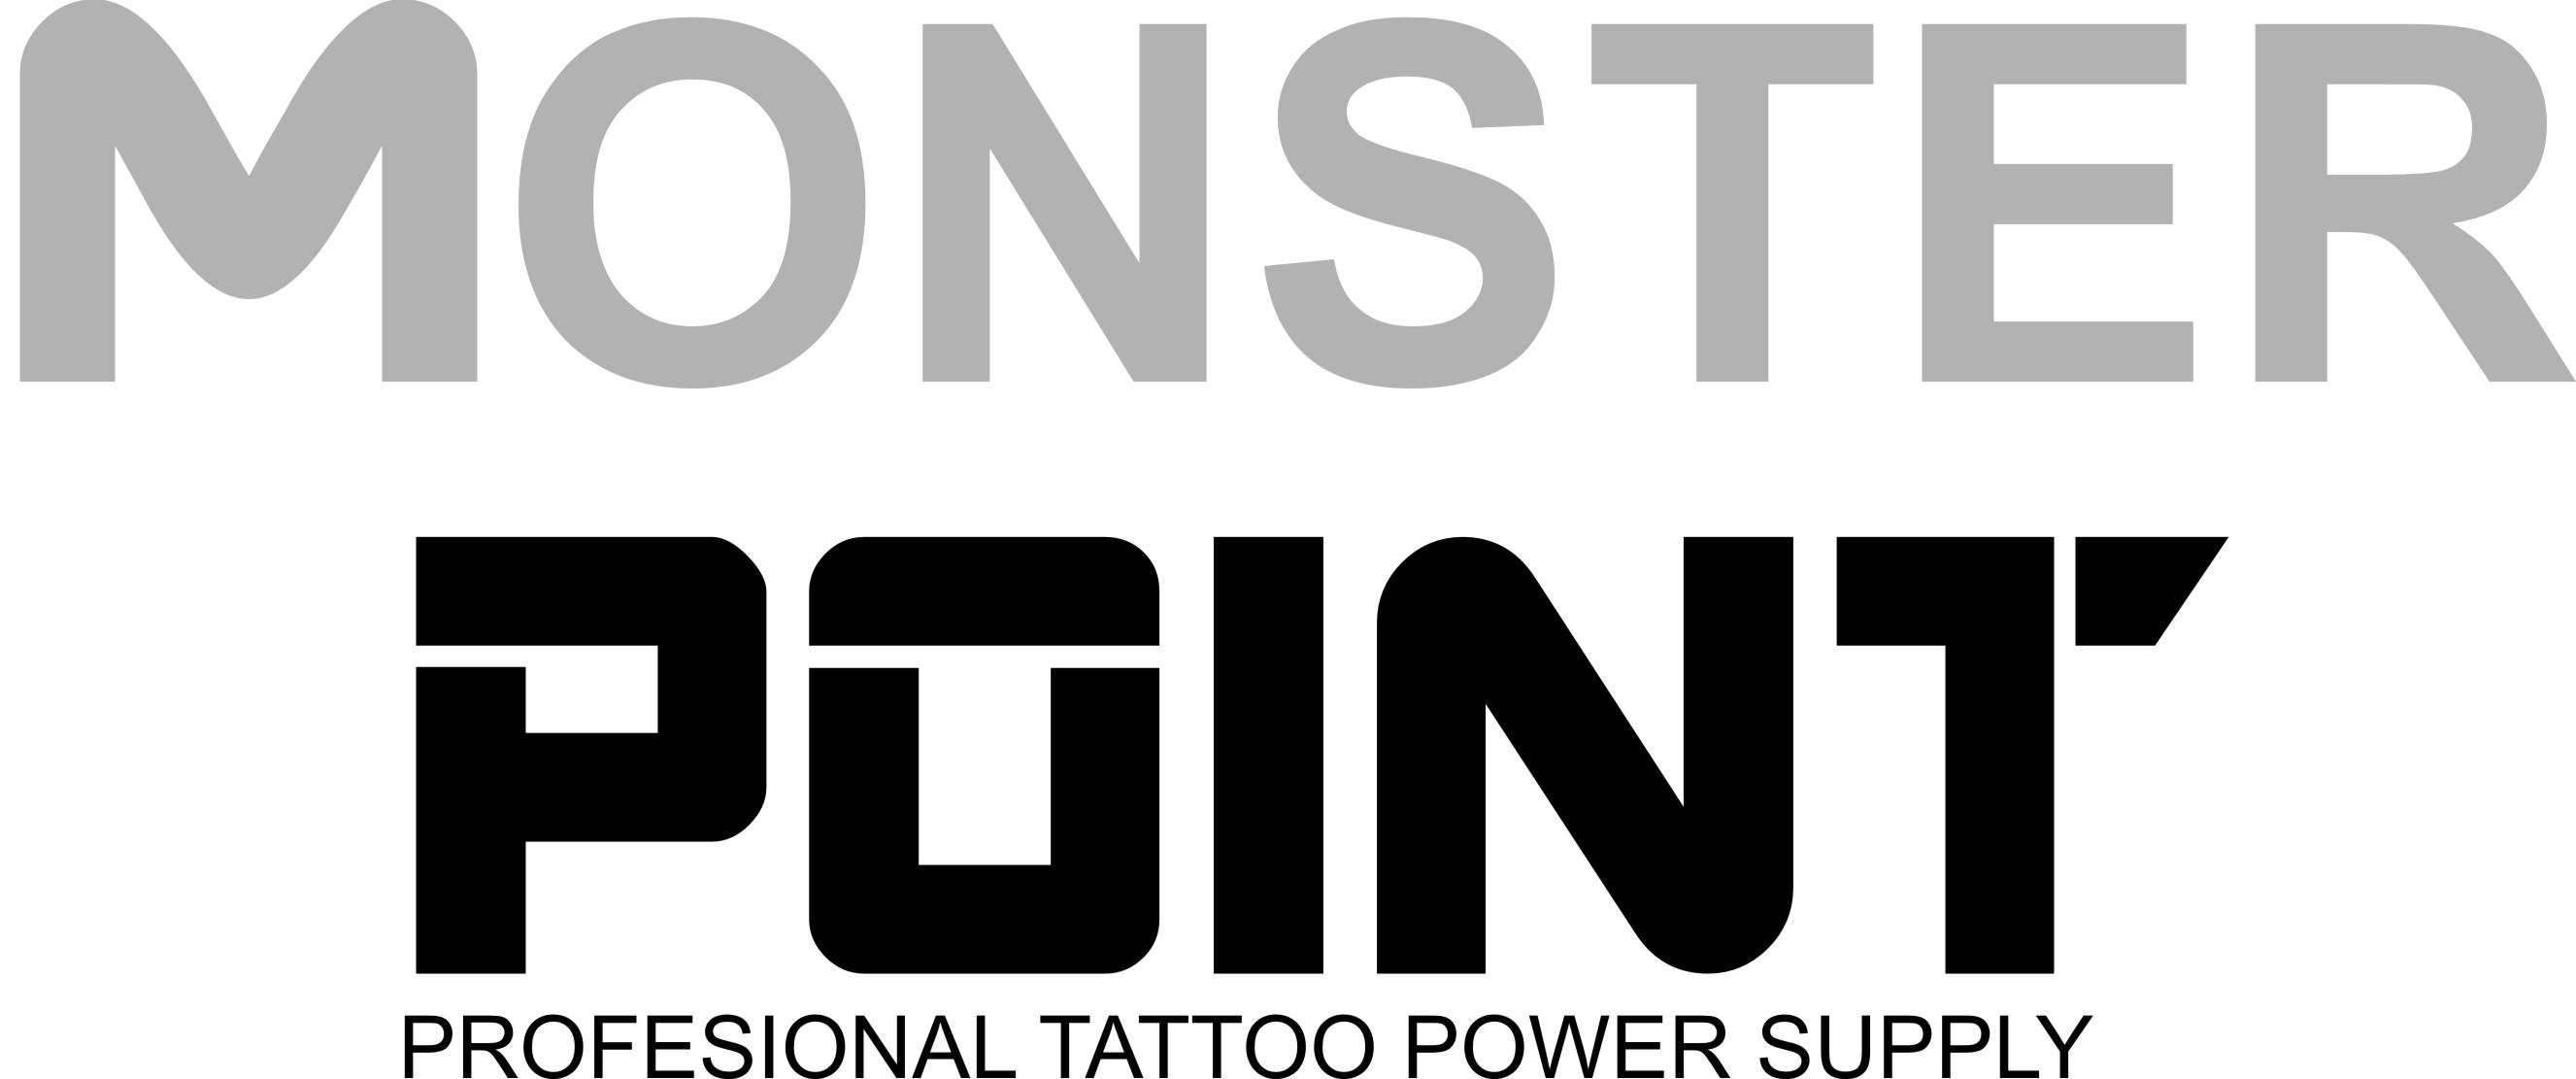 Fuente de poder para tatuar marca monster point cables for Tattoo supply los angeles